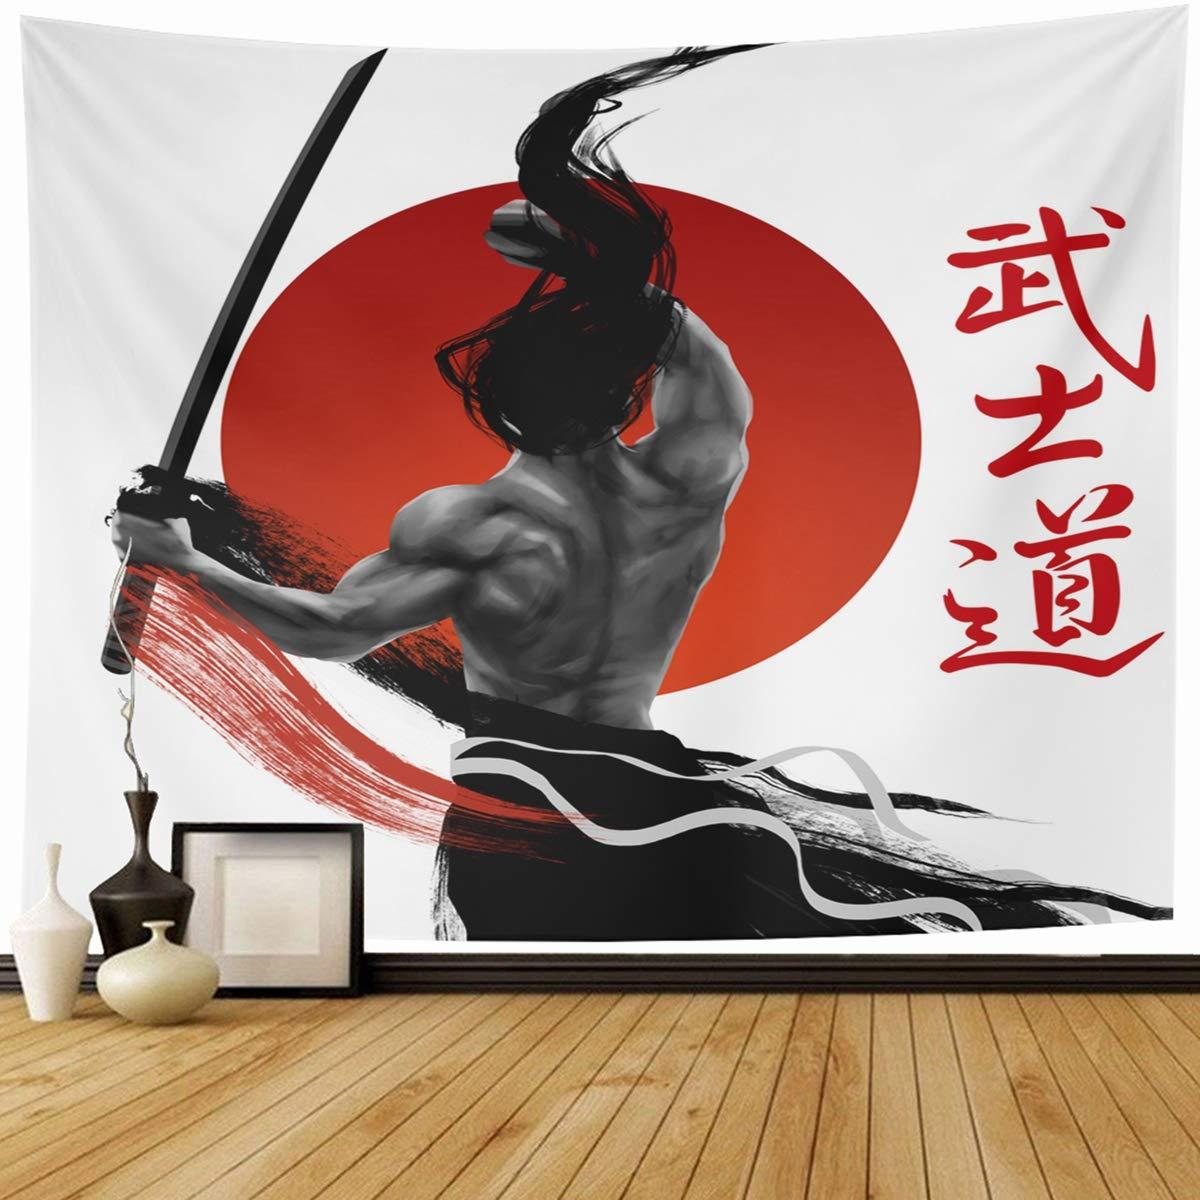 "Ahawoso Tapestry Wall Hanging 80""x60"" Asian Red Warrior Samurai Bushido Ancient Word Way Ninja Asia Martial Home Decor Tapestries Decorative Bedroom Living Room Dorm"